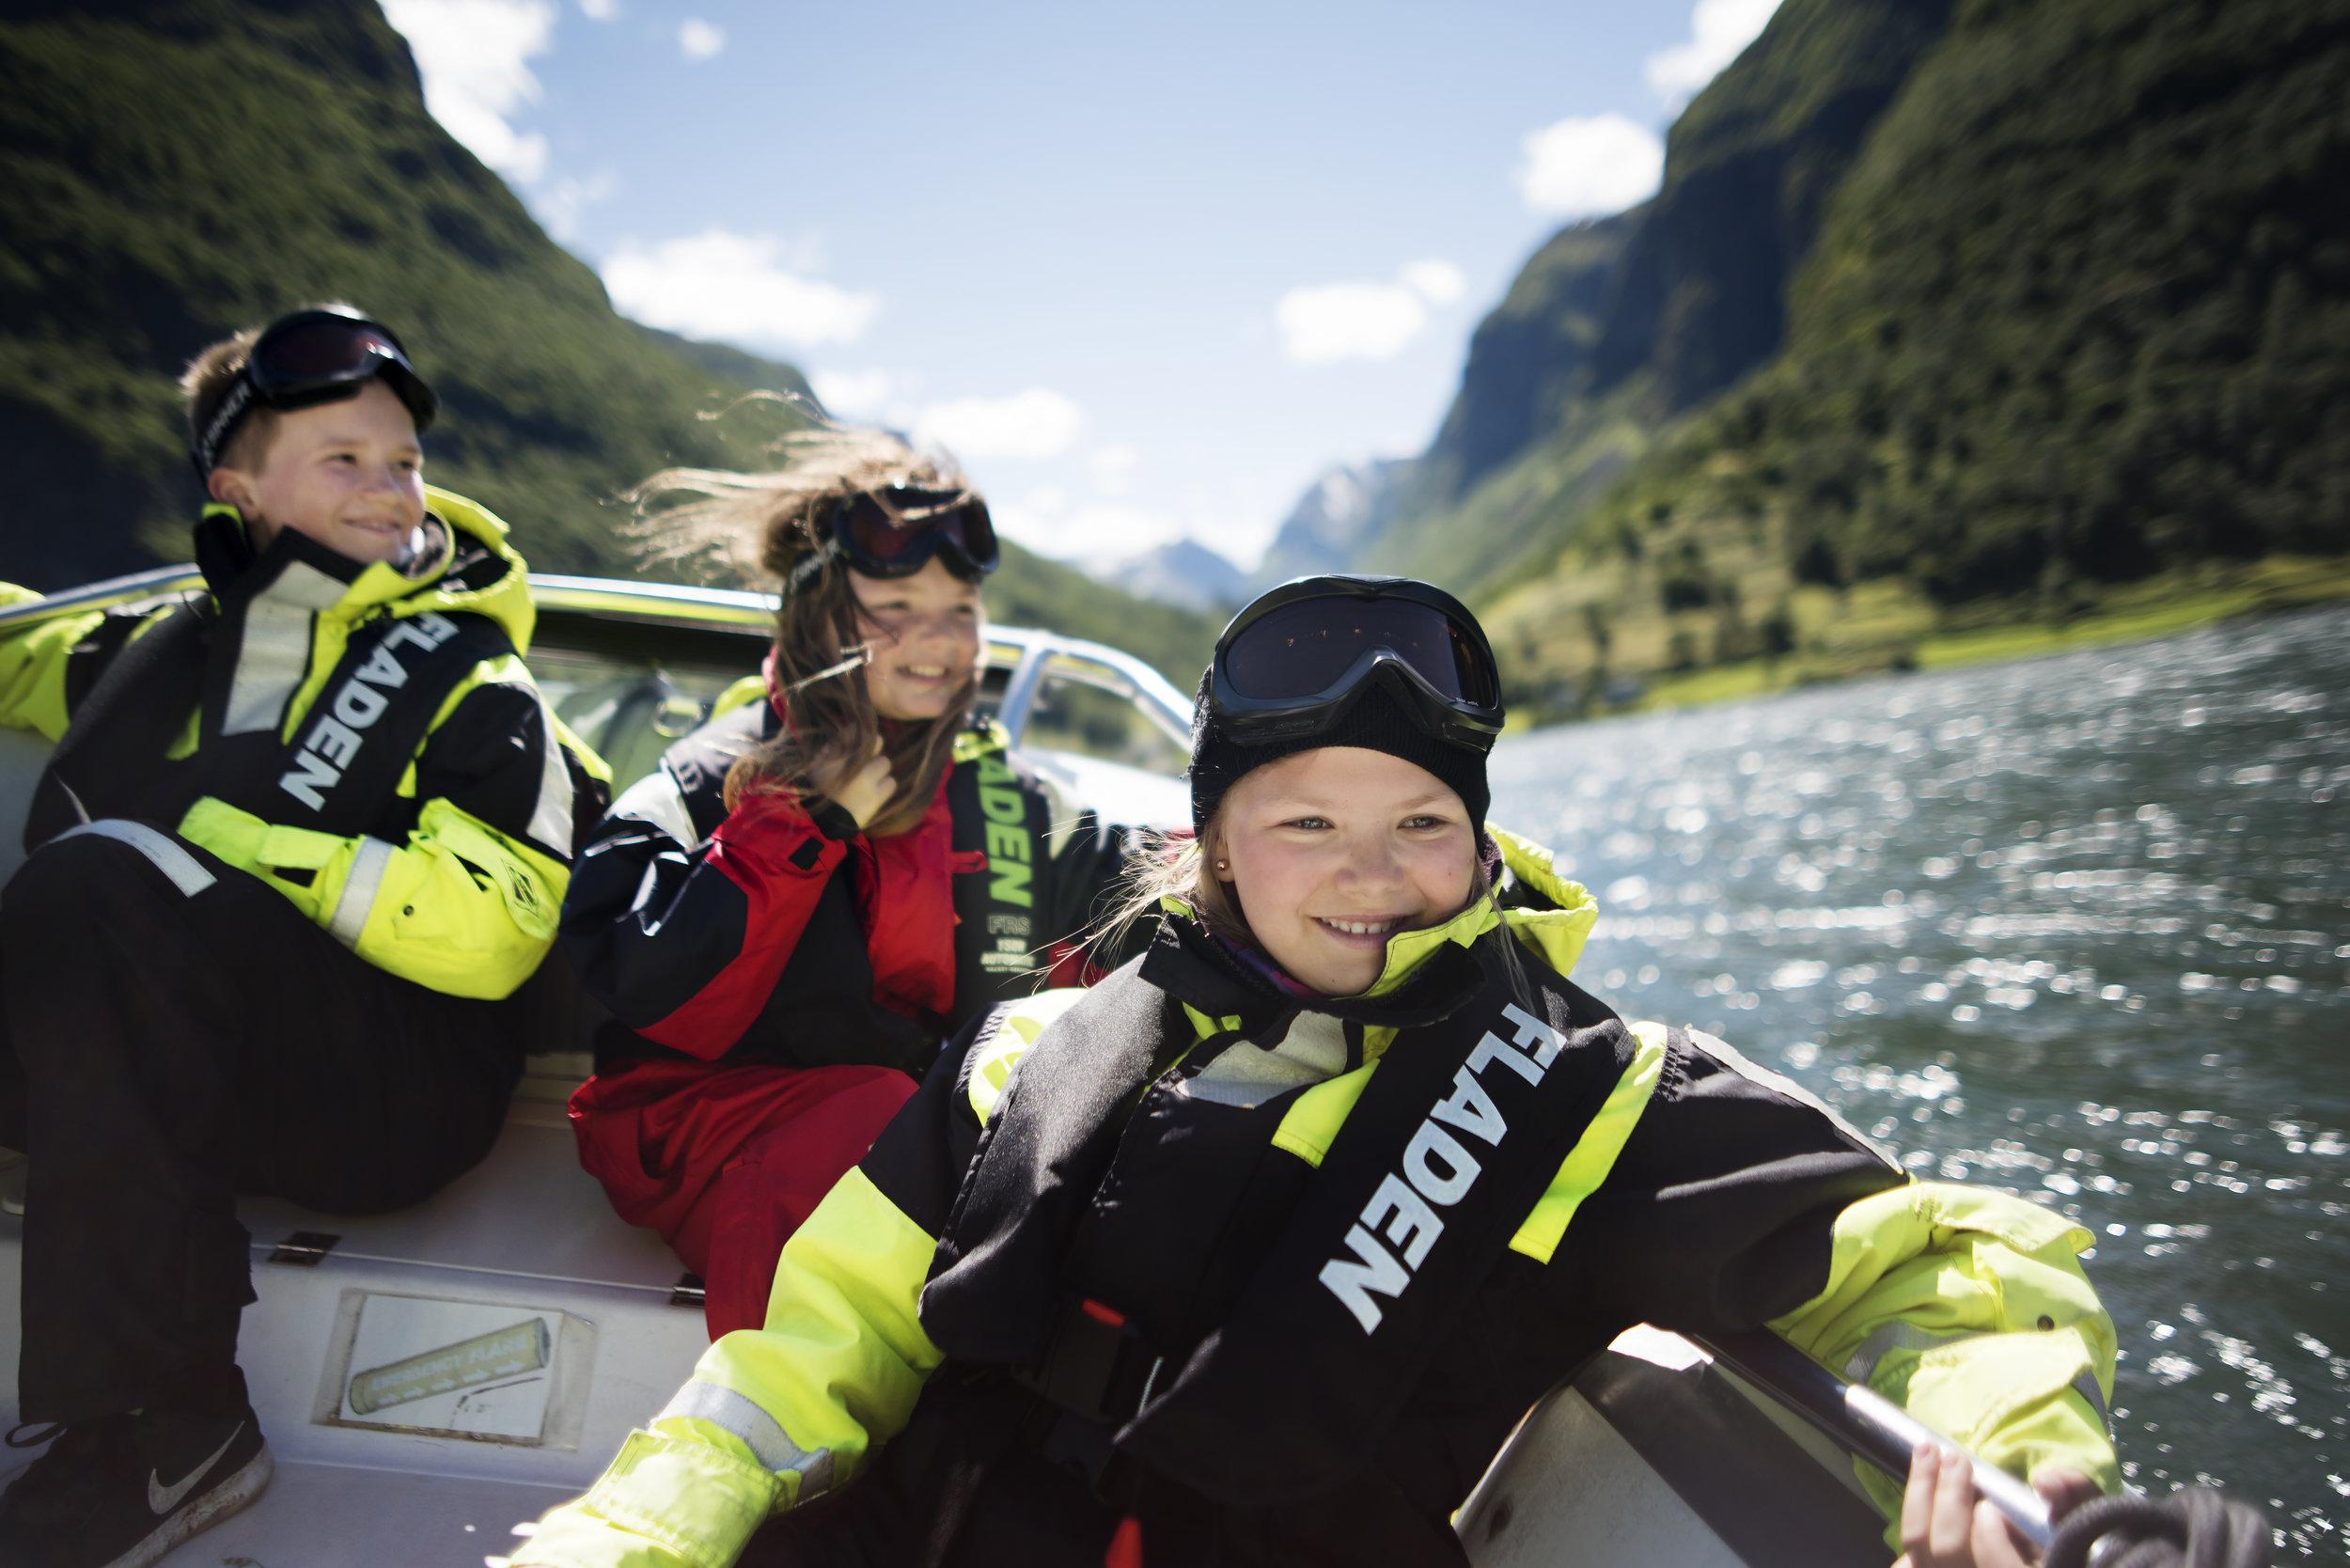 practical information - Time/period: 2 hours and 15 min. (Flåm - Gudvangen - Flåm)June 1st. 2019 - August 31st. 2019:Departure at 09:30-11:45, 11:00 -13:15, 13:50 - 16:05, 17.10 – 19.25.Meet: 20 minutes prior to departure in FjordSafari reception / Price:Adults NOK 860,- / Children NOK 640,- (free for children below 4 years)